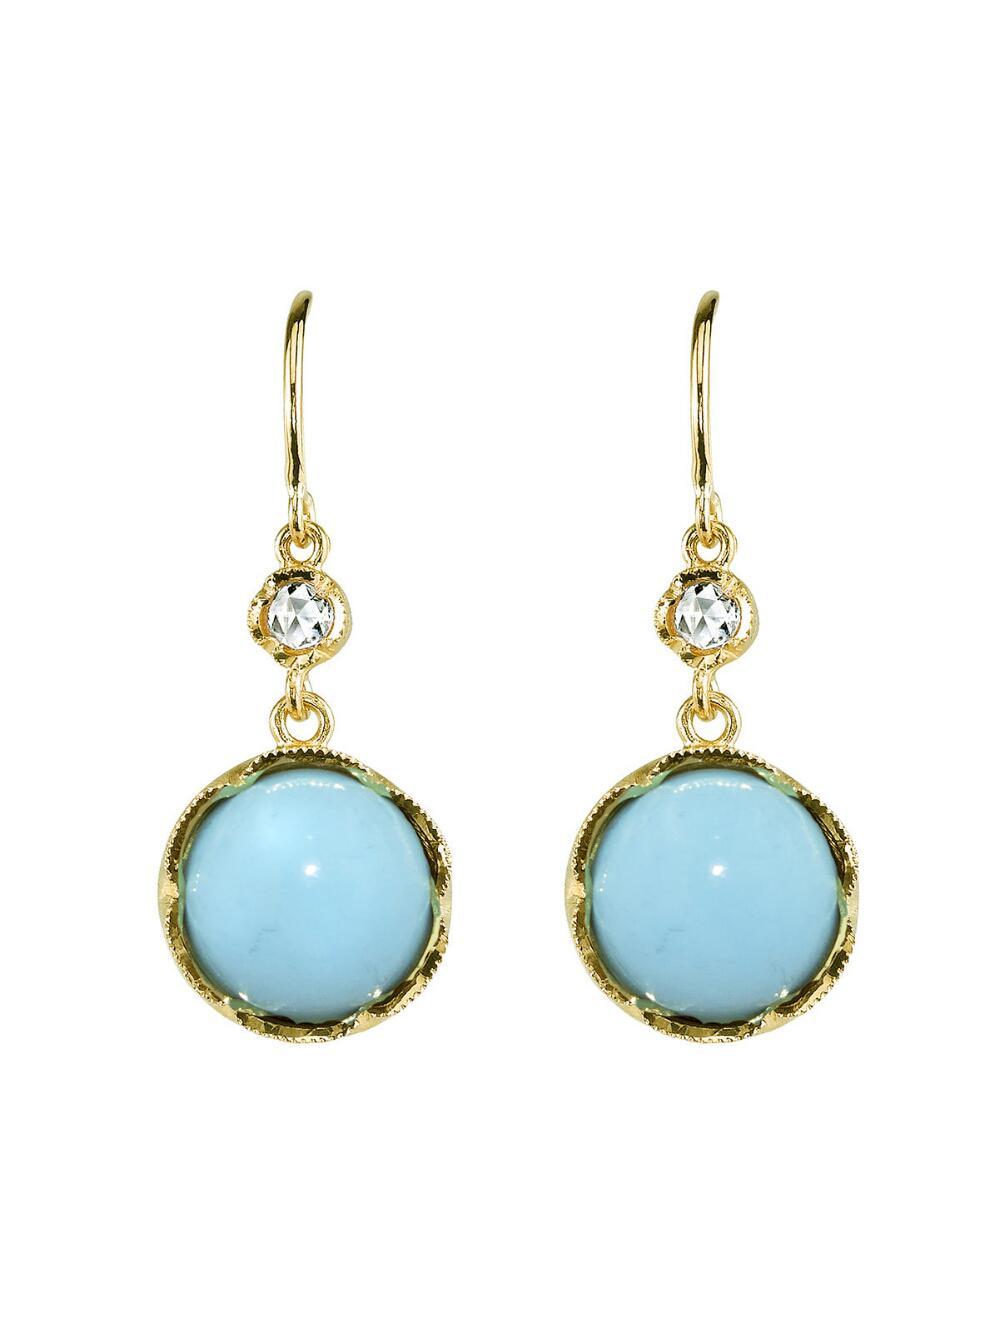 Irene Neuwirth turquoise stud earrings - Blue EpOcnv6